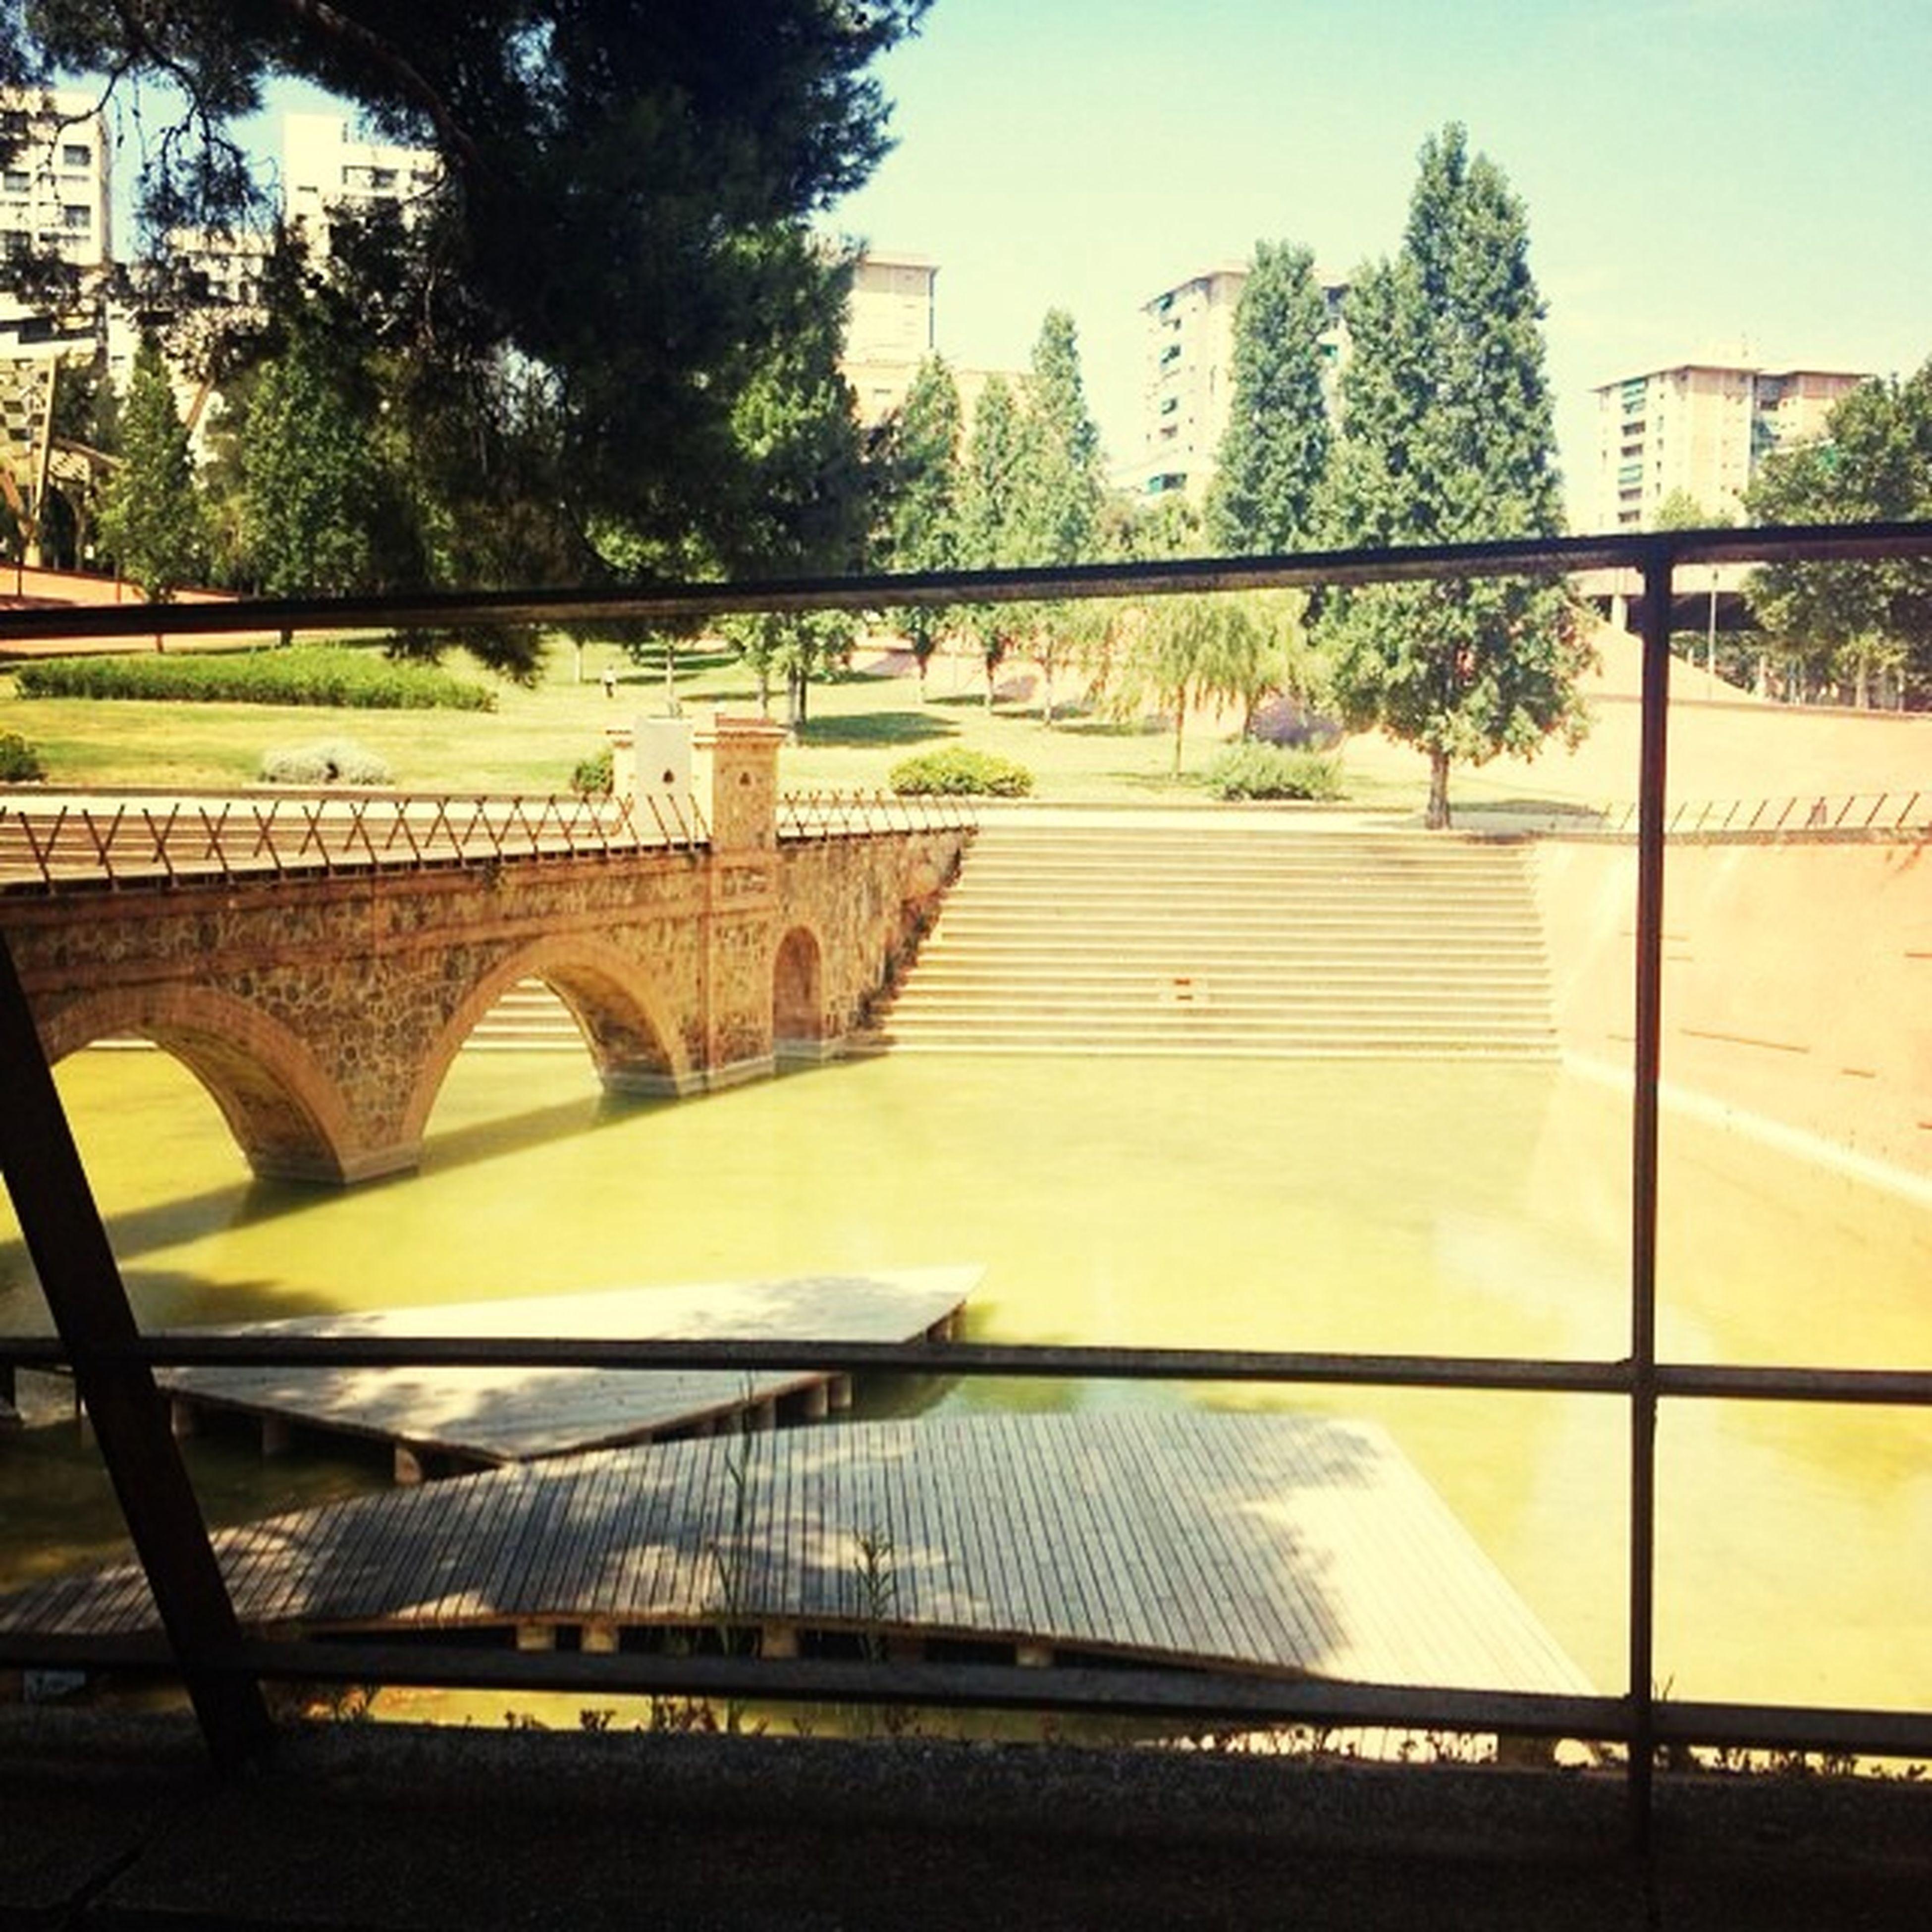 Plaza de Nou Barris Nou Barris plaza Taking Photos